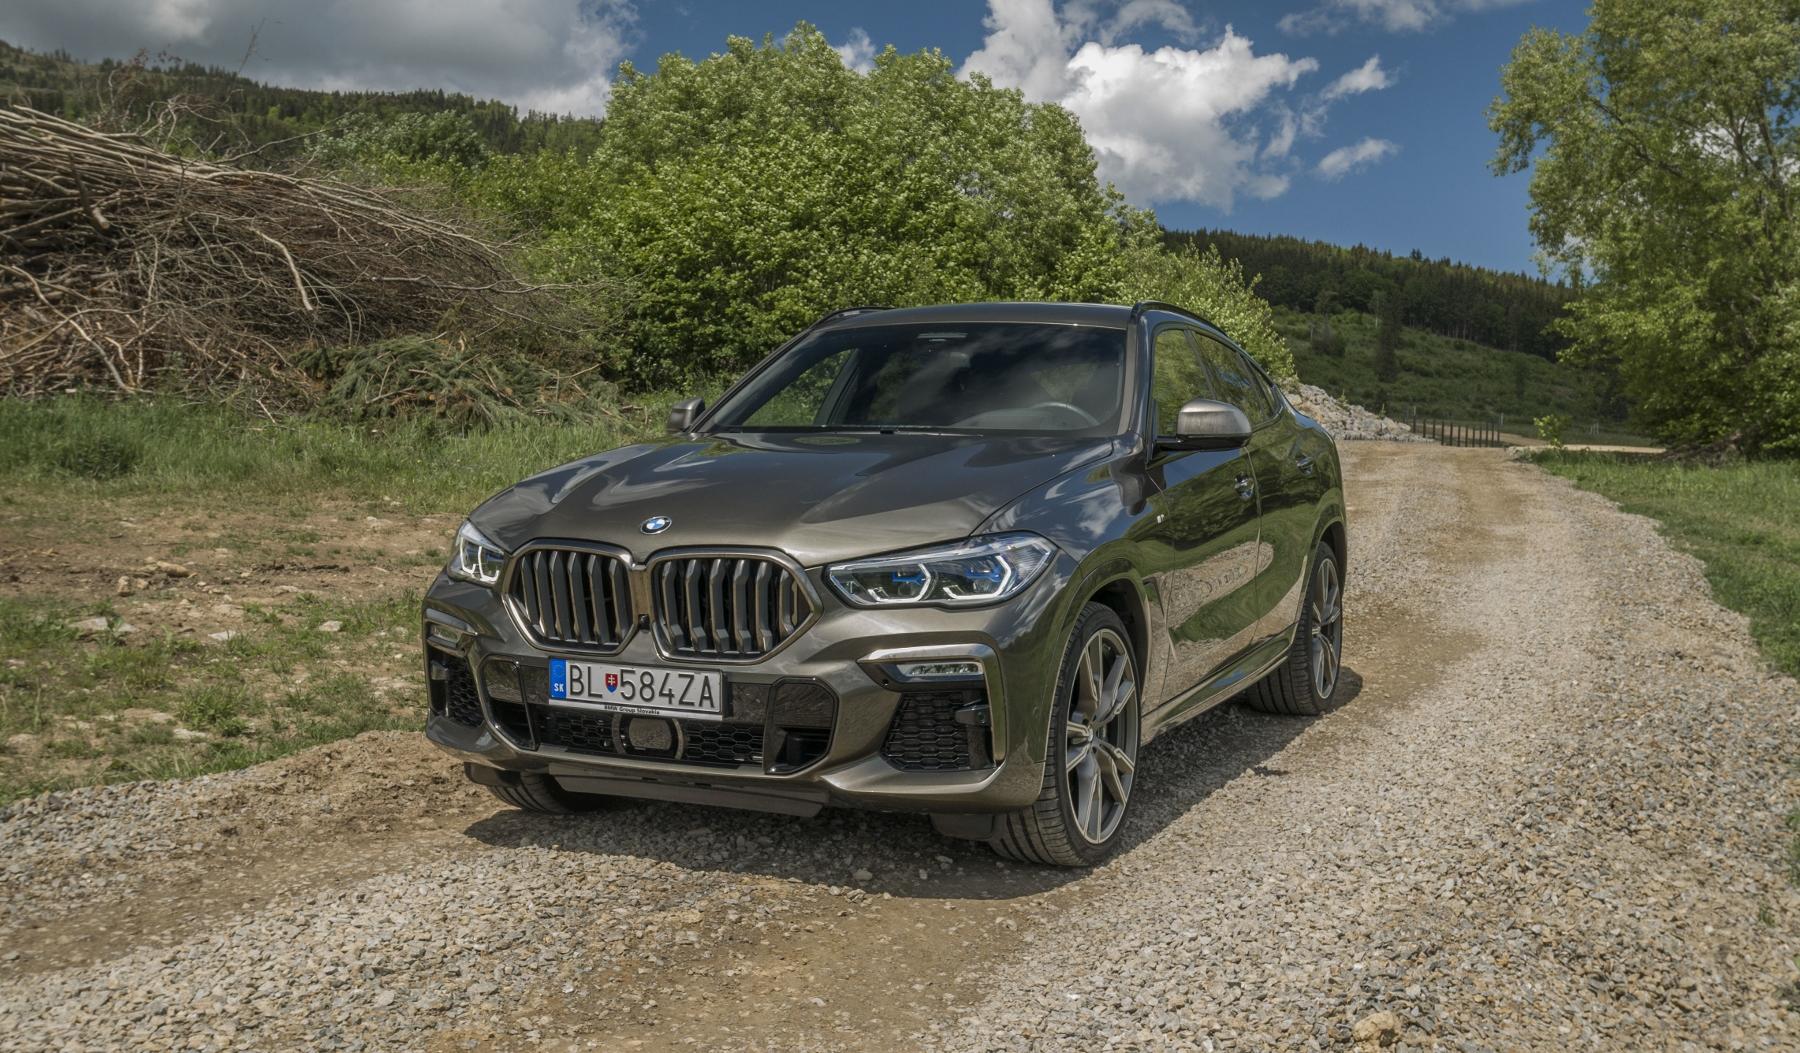 Test: BMW X6 M50i napína benzínové svaly, ale neukazuje plnú silu yLnwGW6tv1 bmw-x6-m50i-27